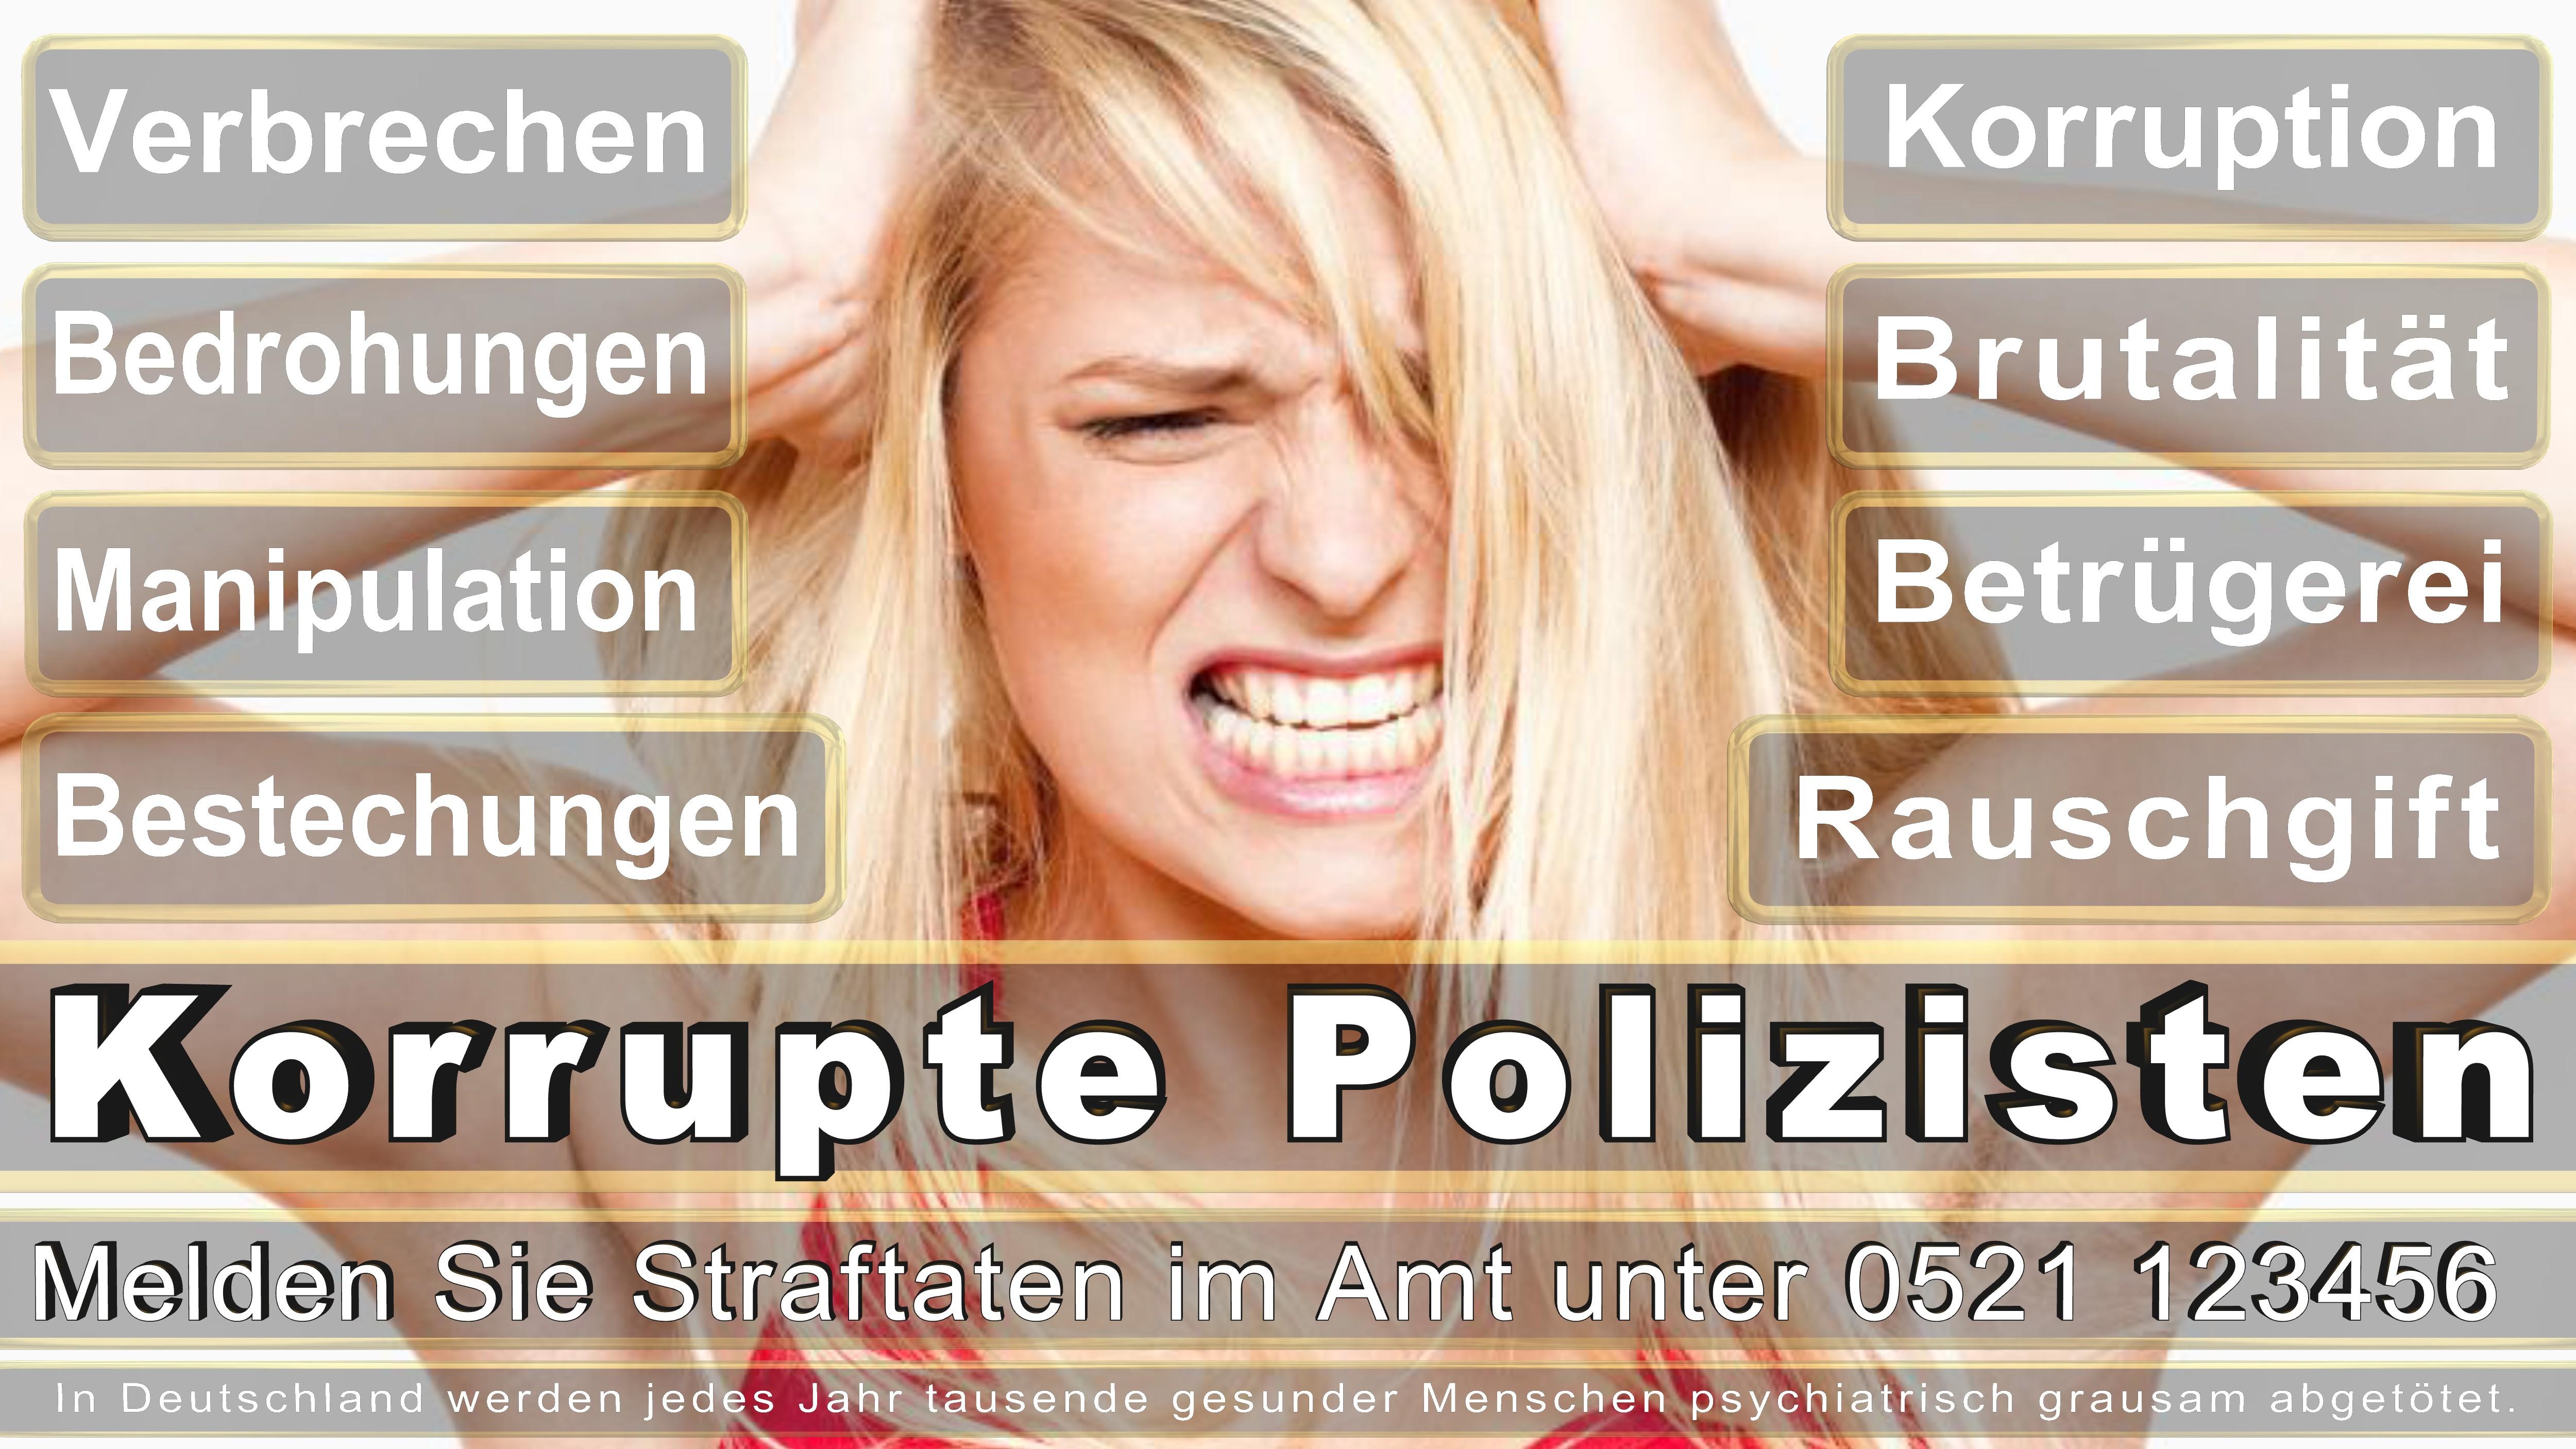 Polizei-Bielefeld-Polizei-Bielefeld-Polizei-Bielefeld (190)